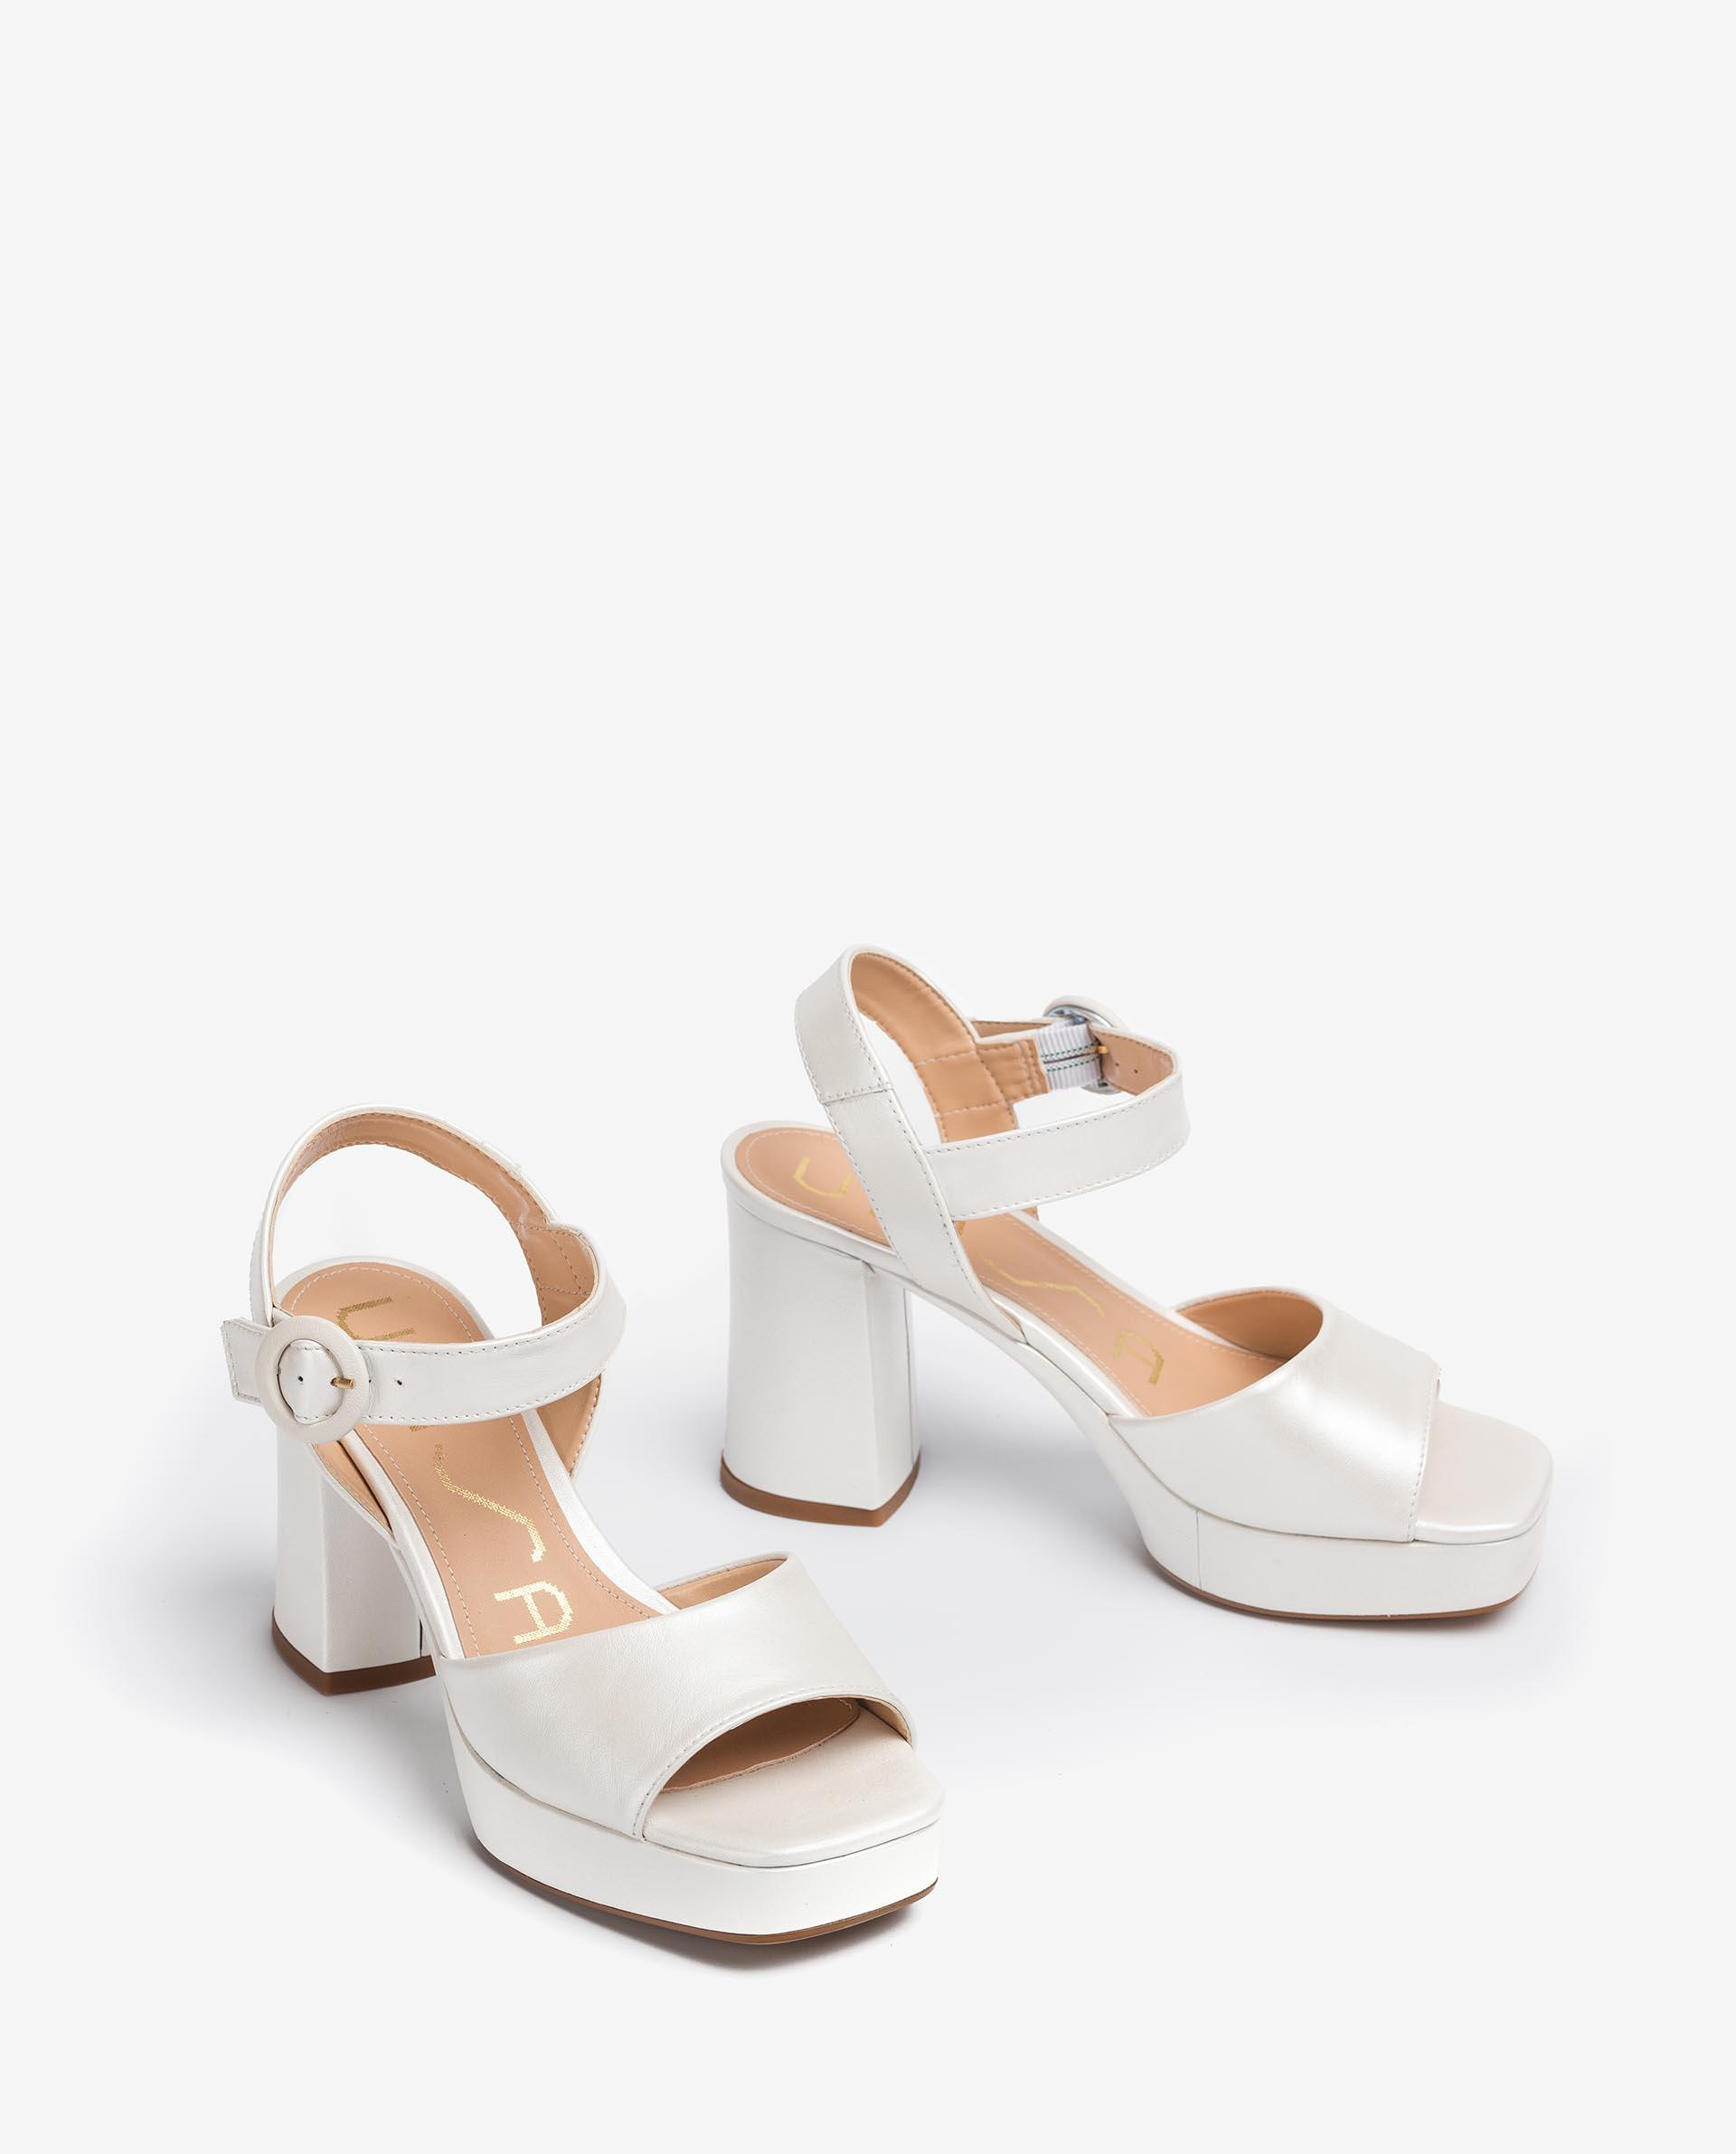 UNISA Bridal sandals with ankle strap ODRAN_NA_N 2